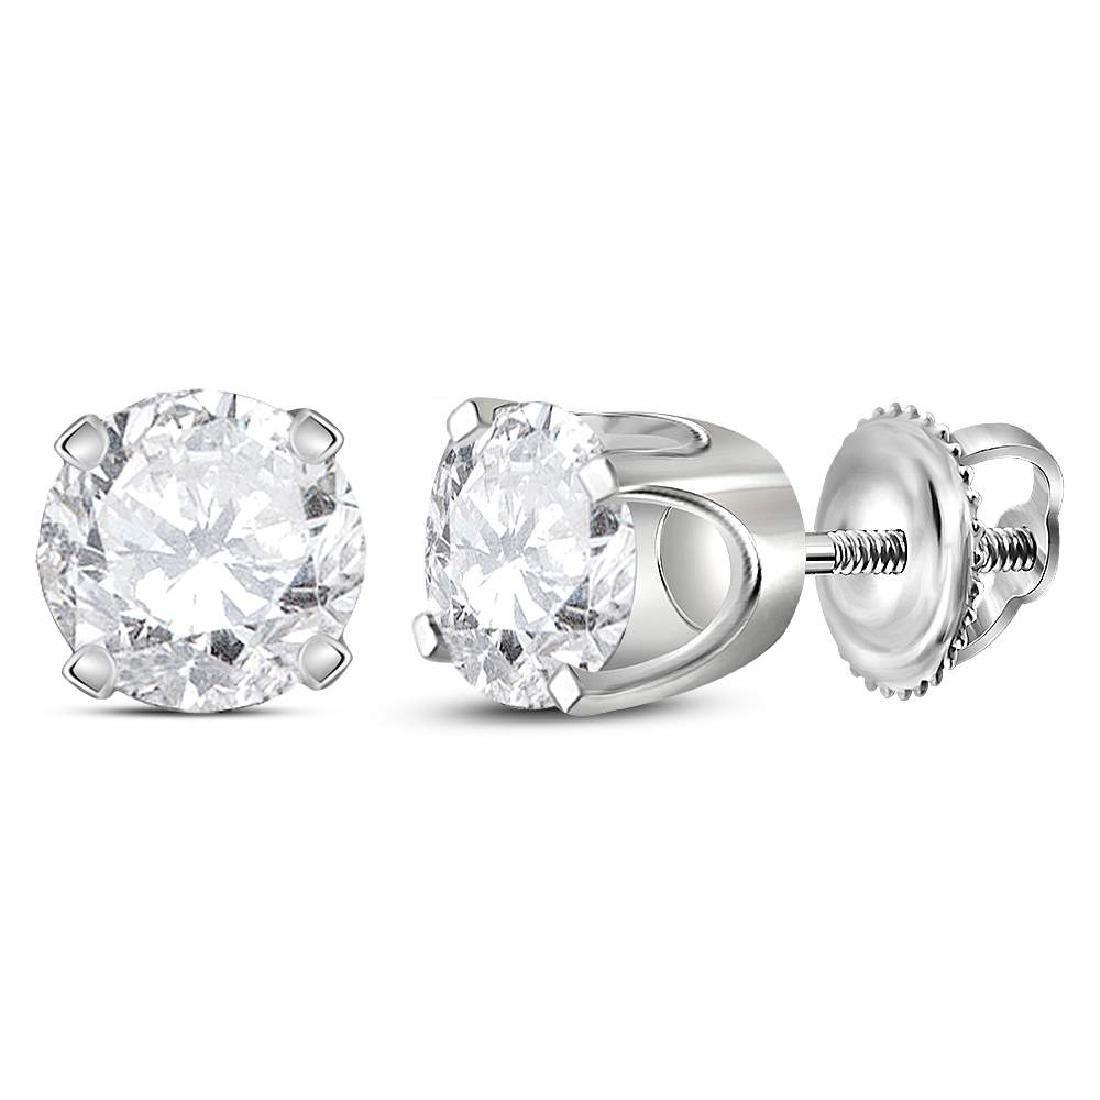 1.03 CTW Diamond Solitaire Stud Earrings 14KT White